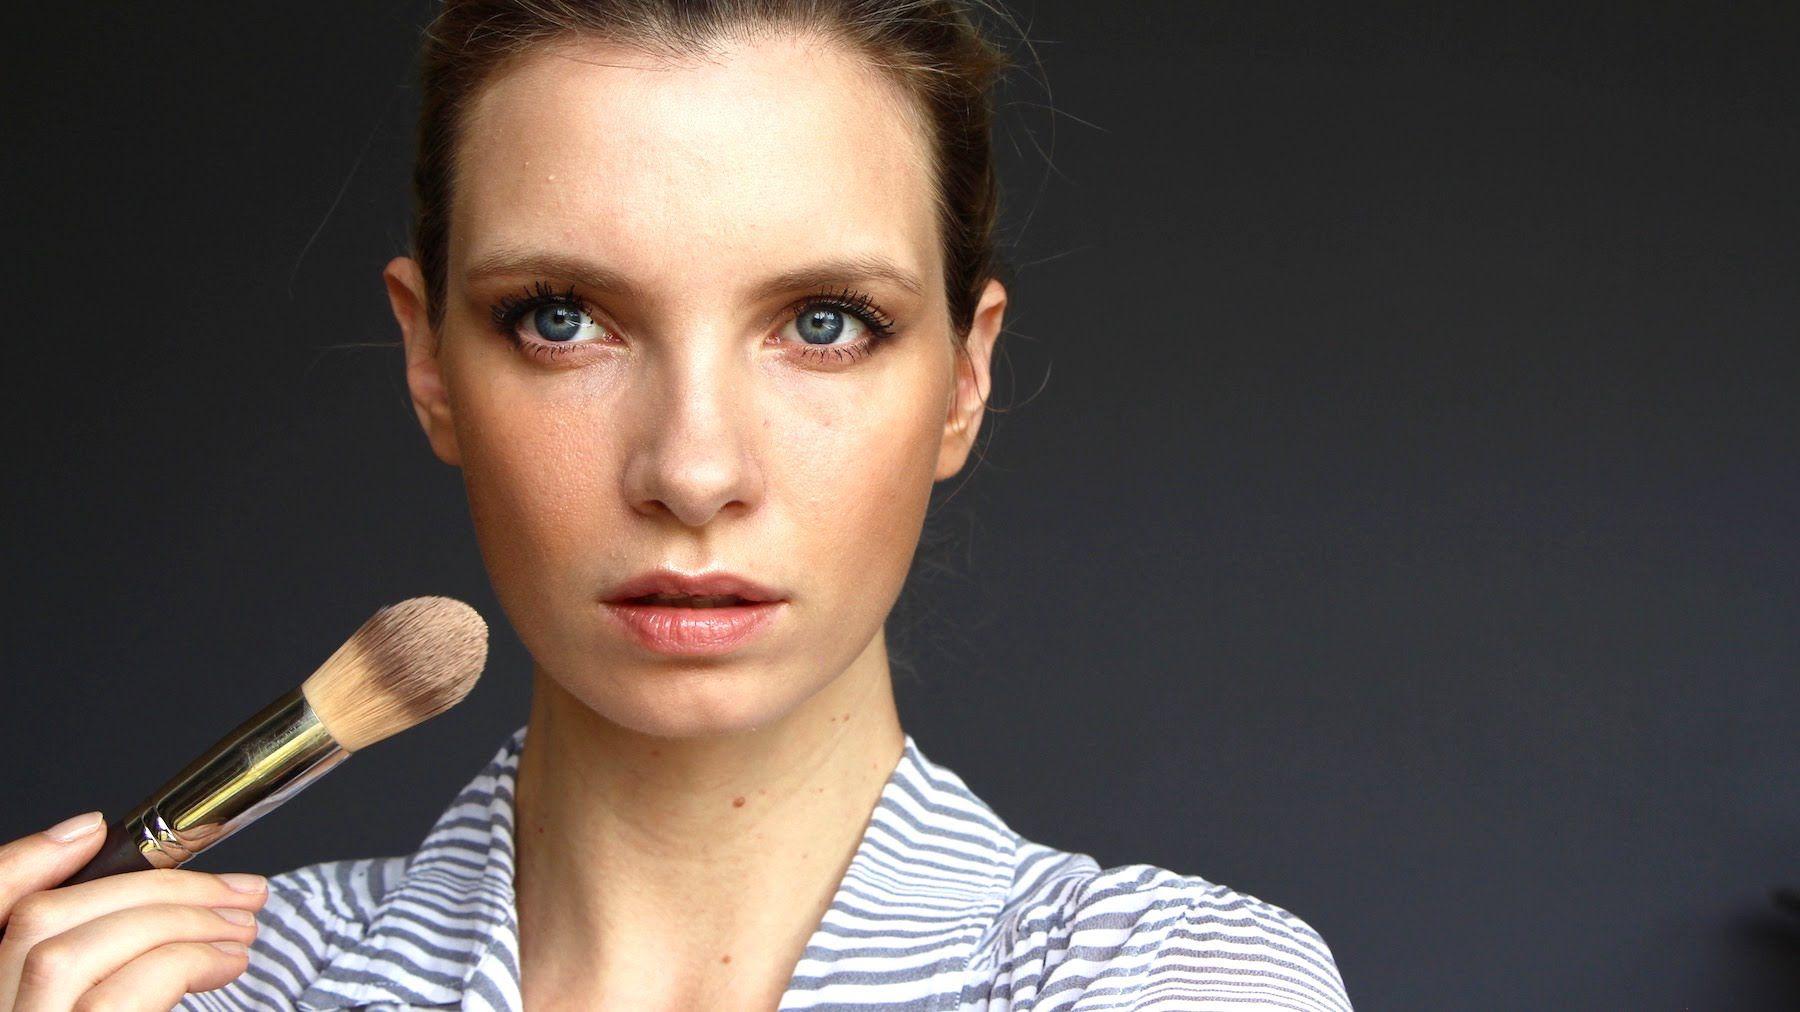 Sheer and Natural Everyday Makeup A Model